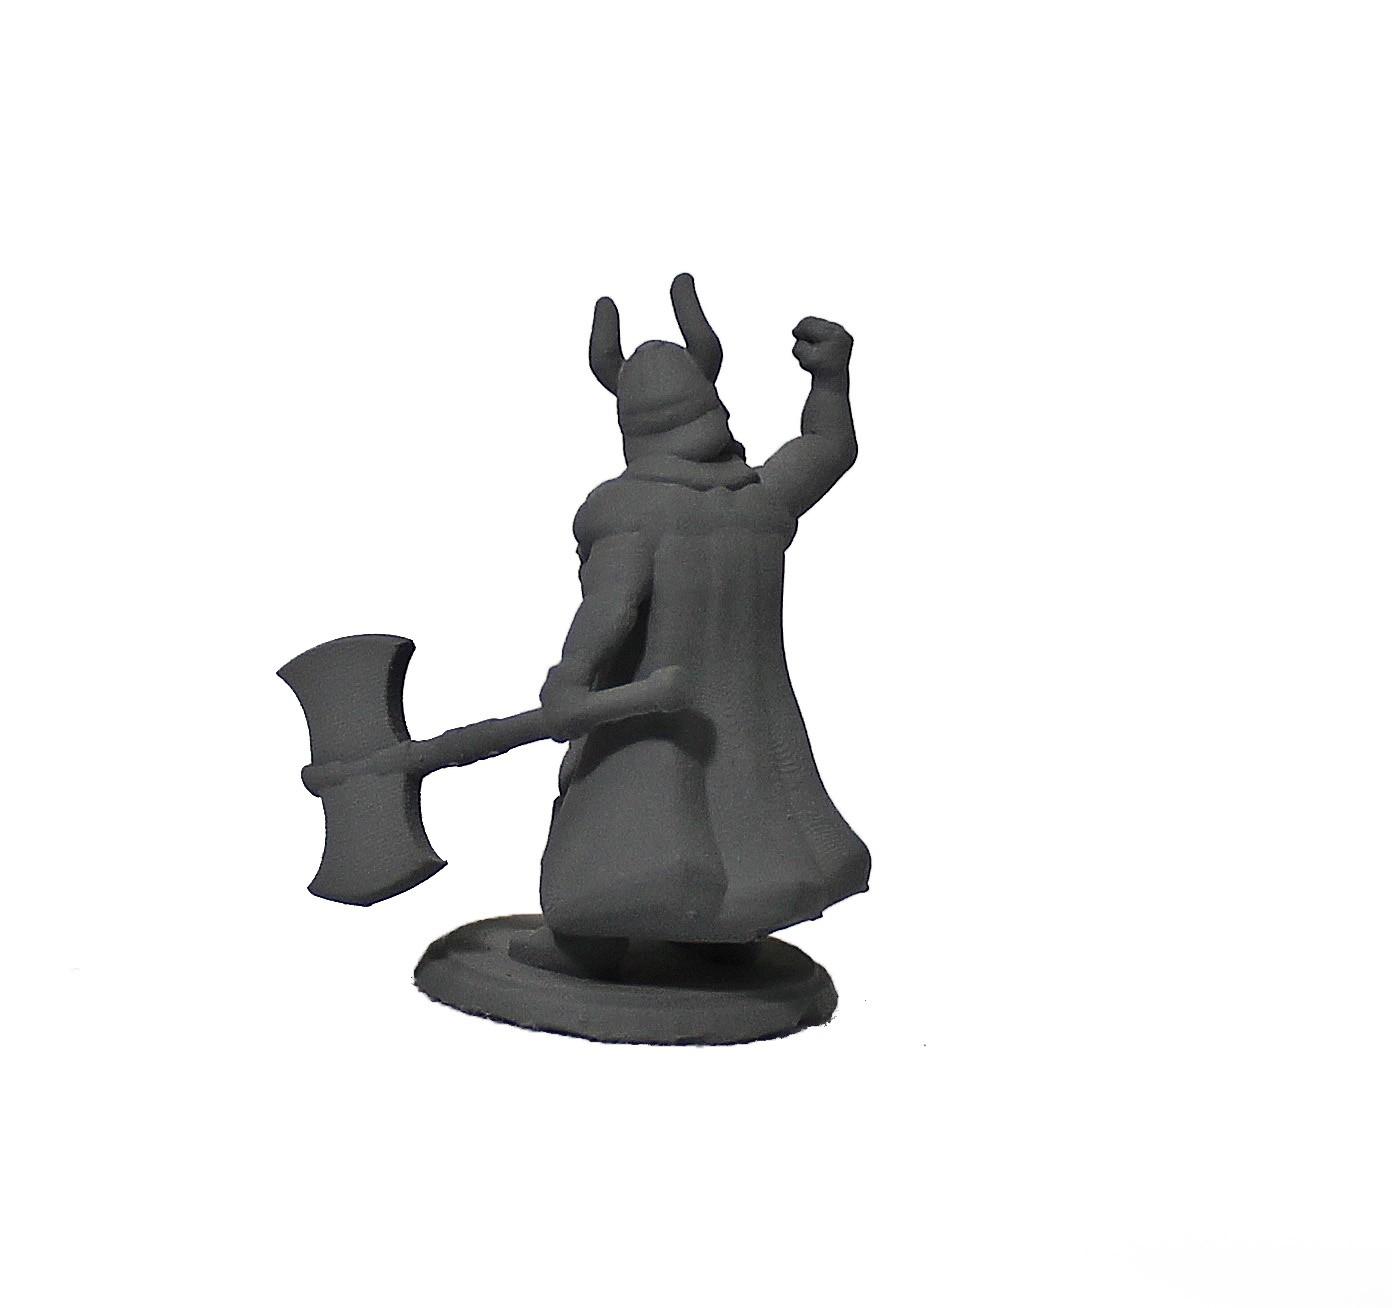 Anão miniatura RPG Boargame Hobby pintura Dwarf  - Dragon Store